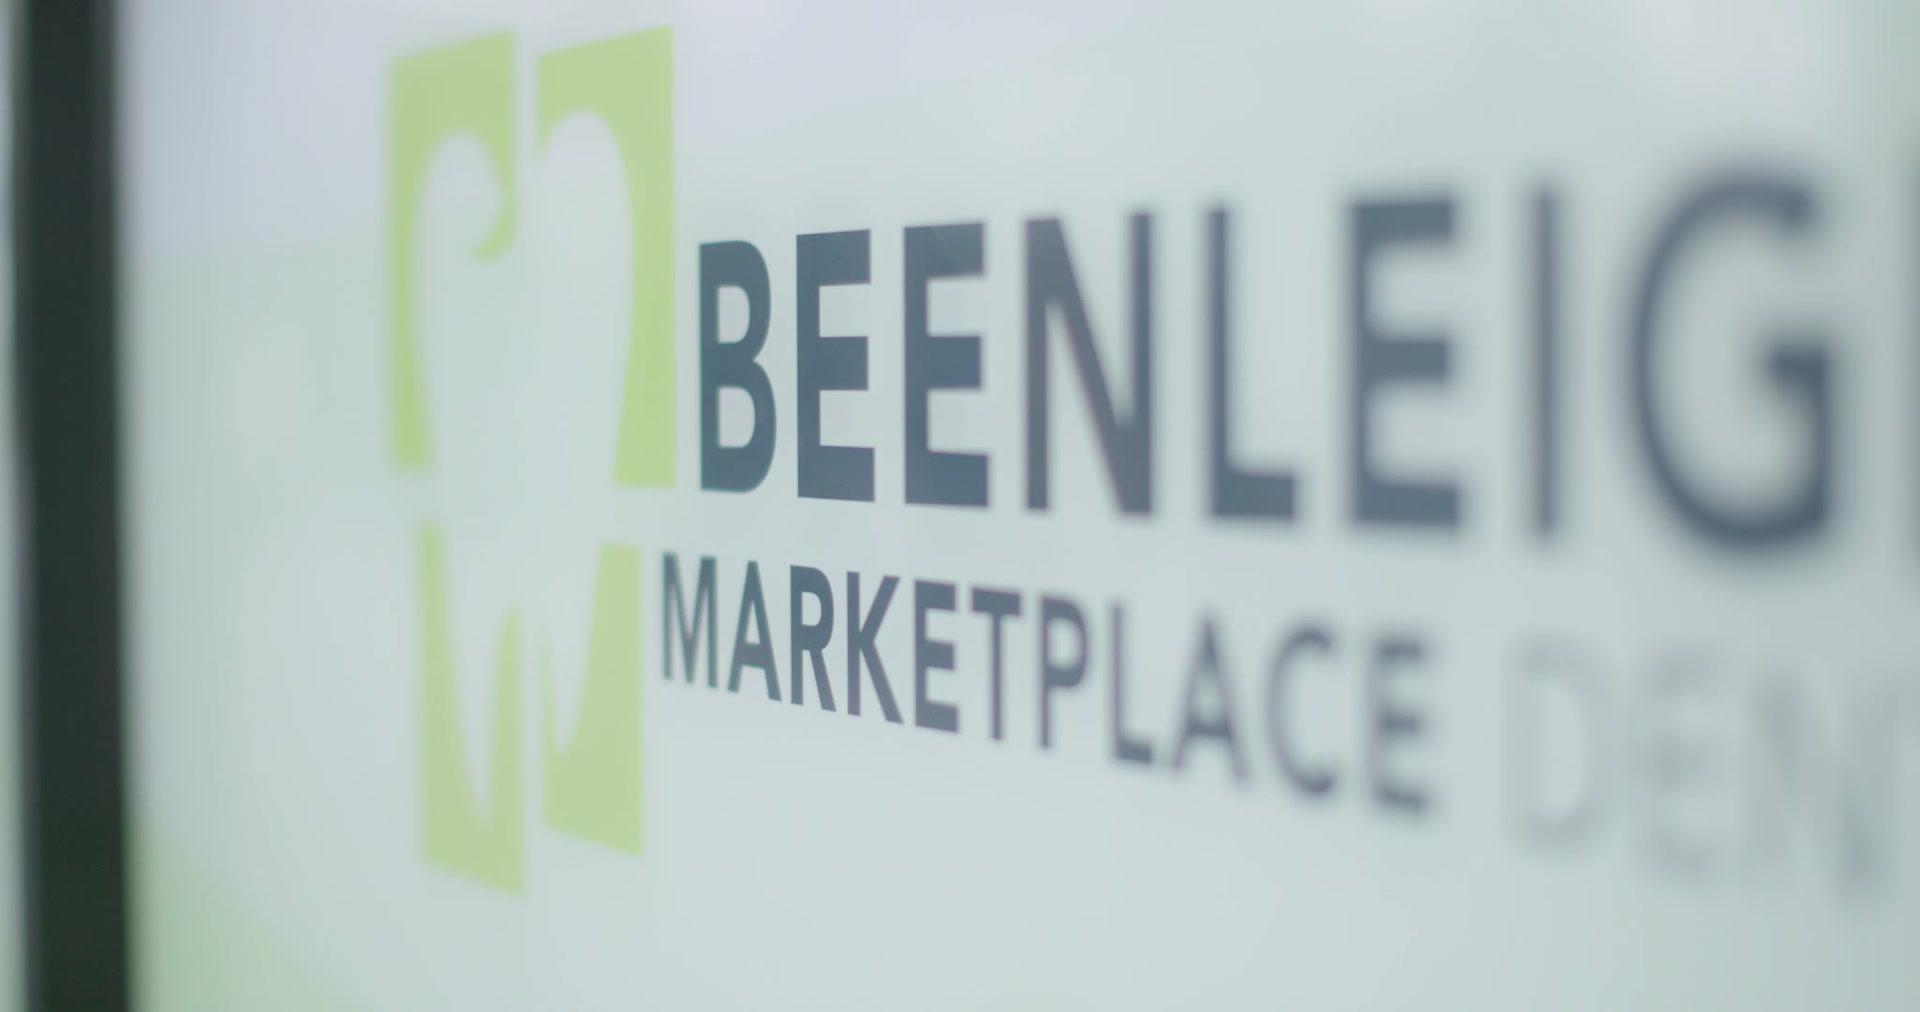 Beenleigh Marketplace Dental Trailer